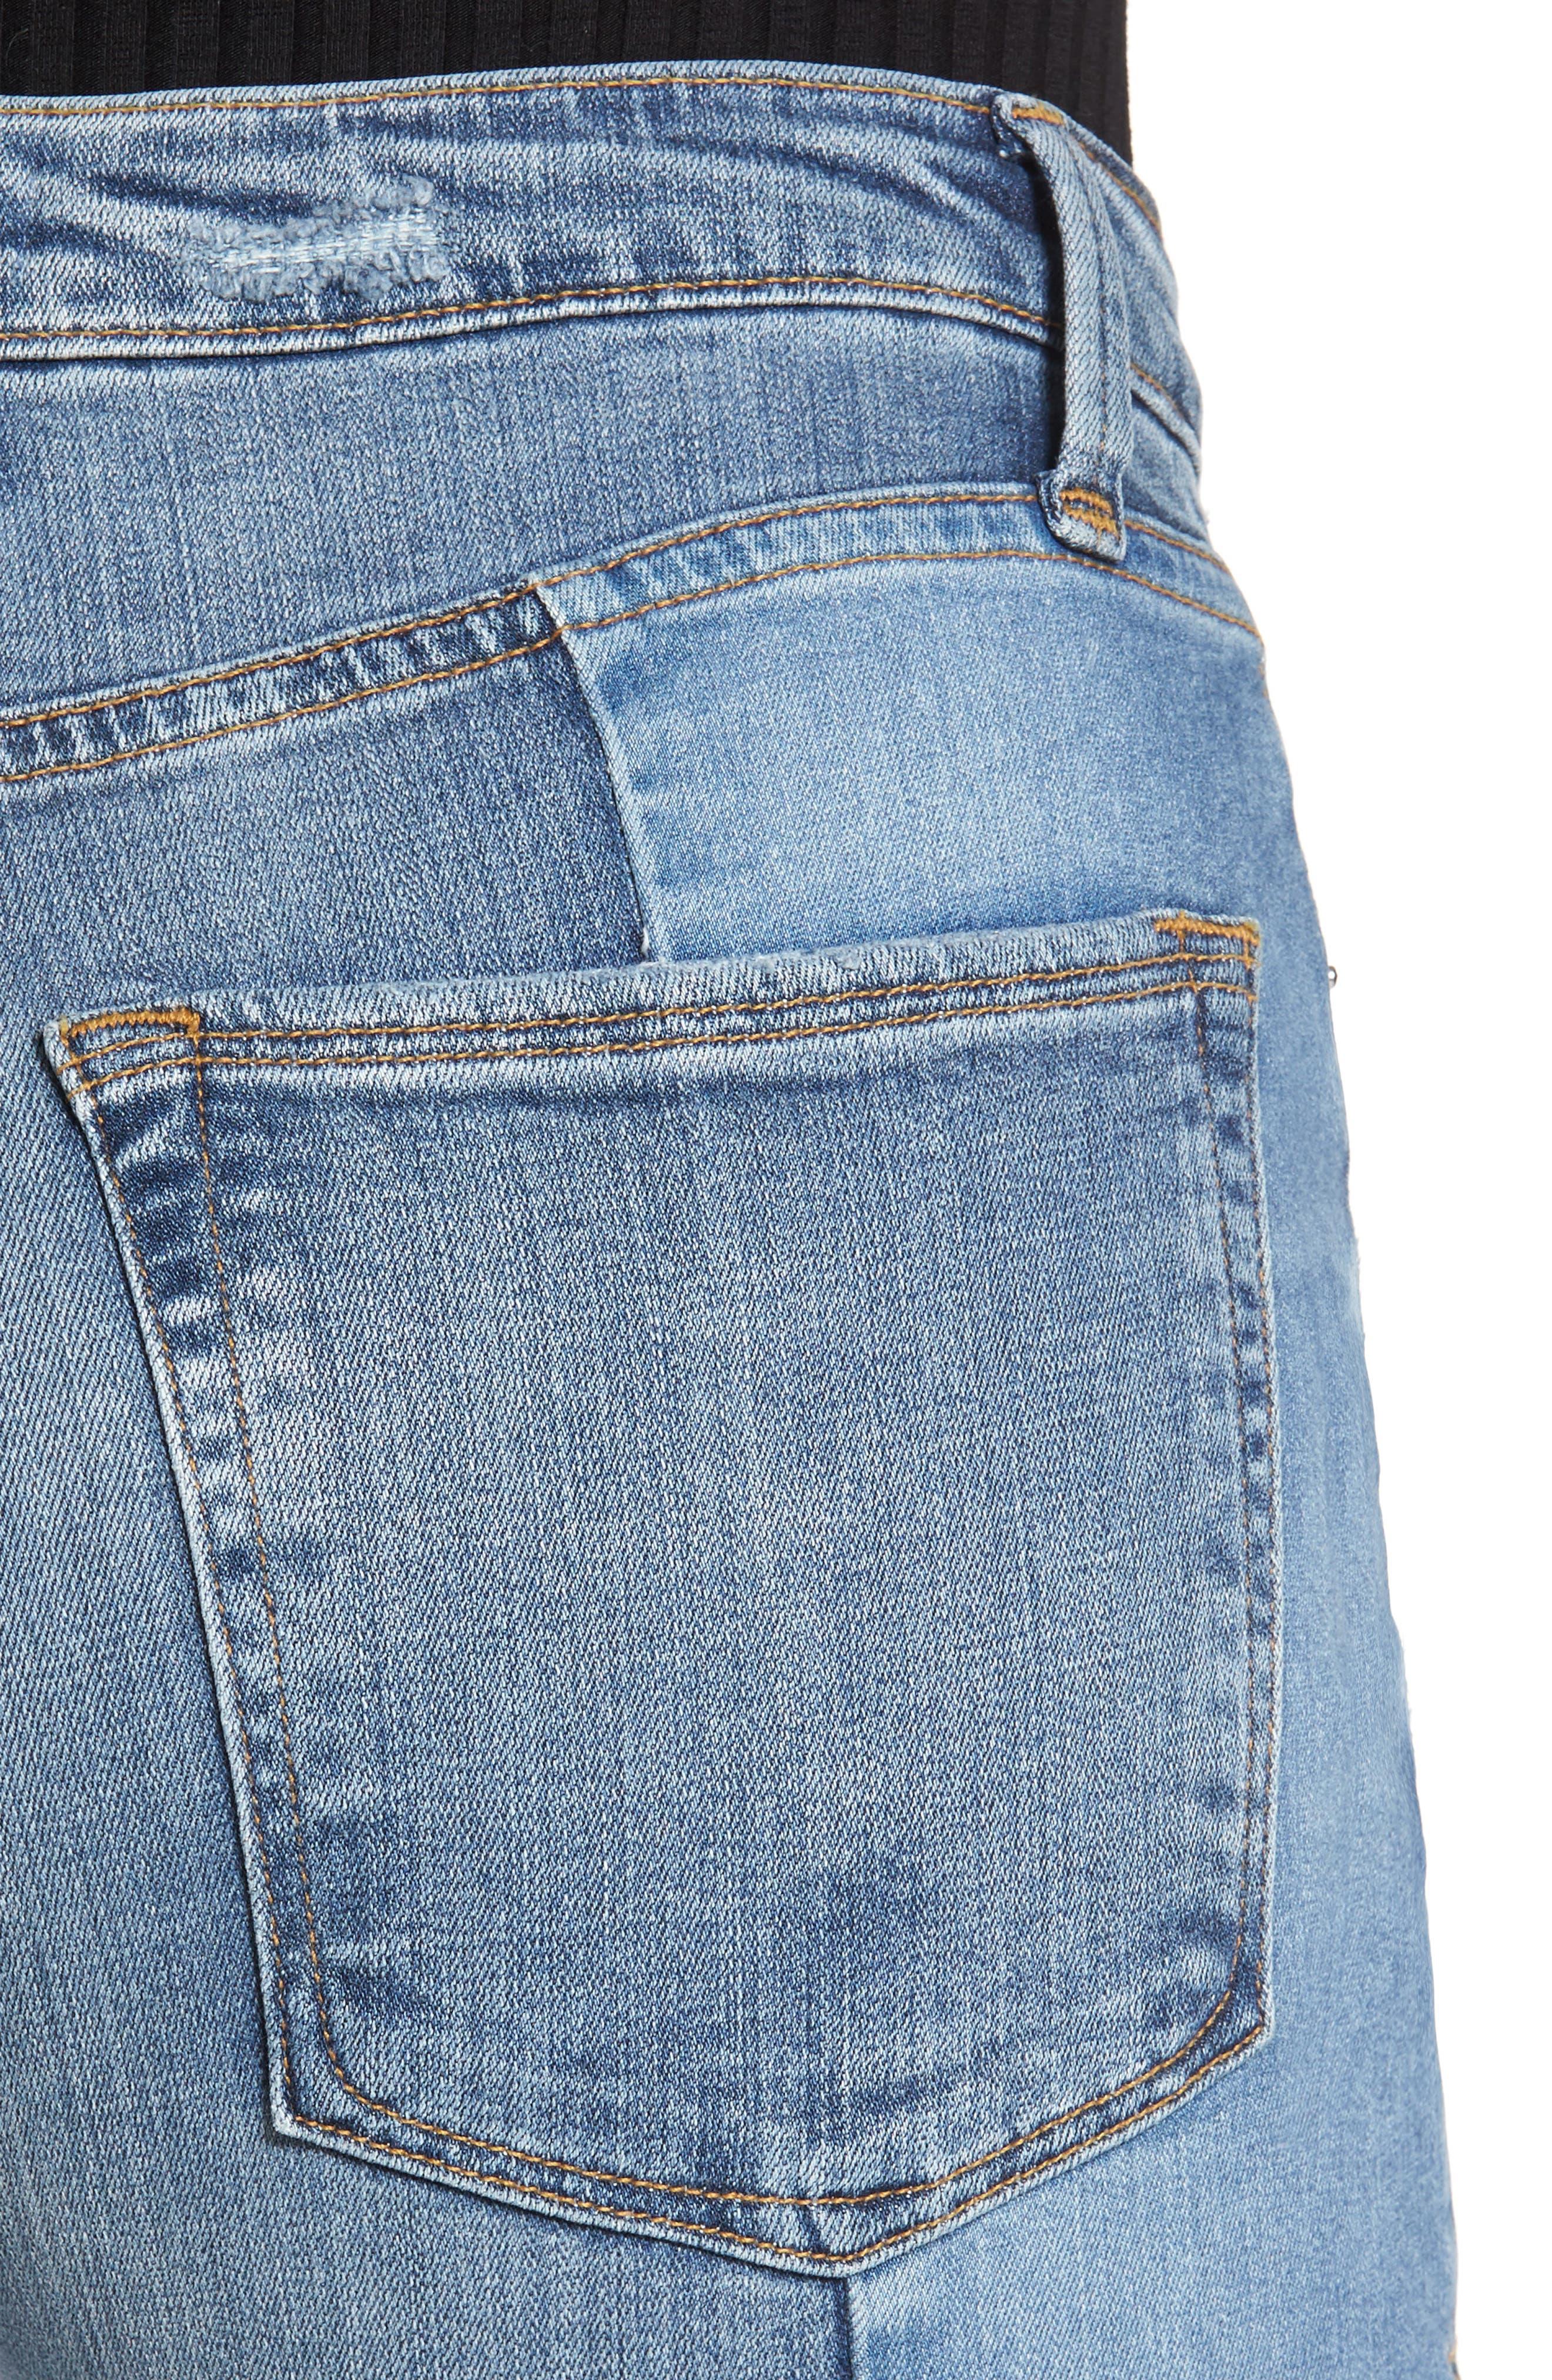 Raw Hem High Waist Skinny Jeans,                             Alternate thumbnail 4, color,                             401